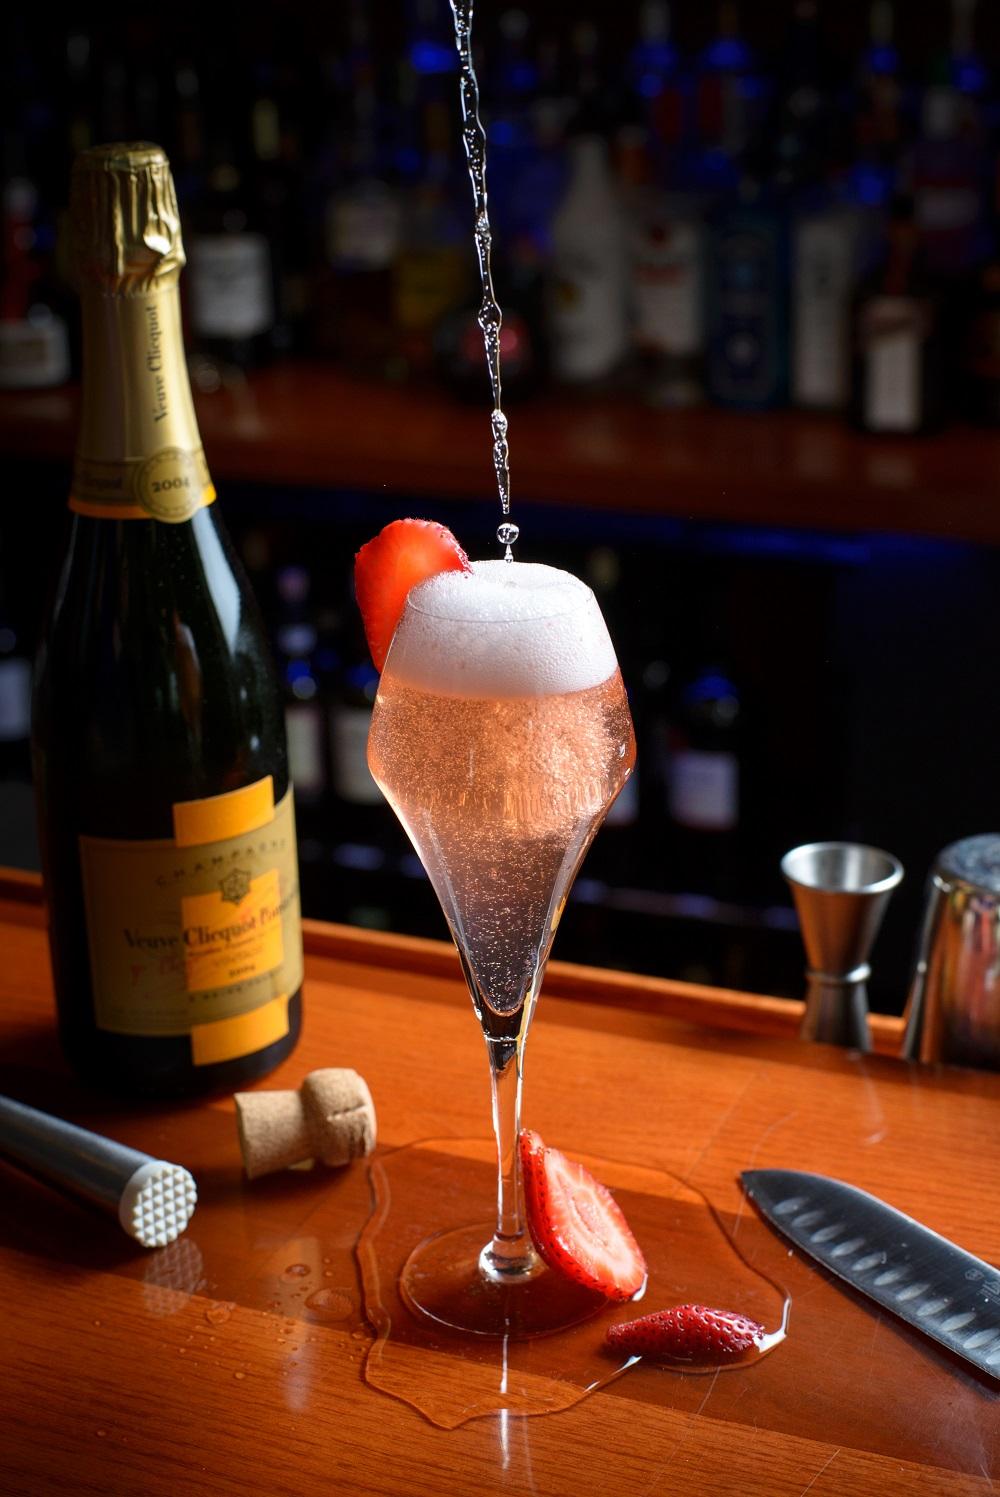 cocktail at Spiro's Lounge & Restaurant